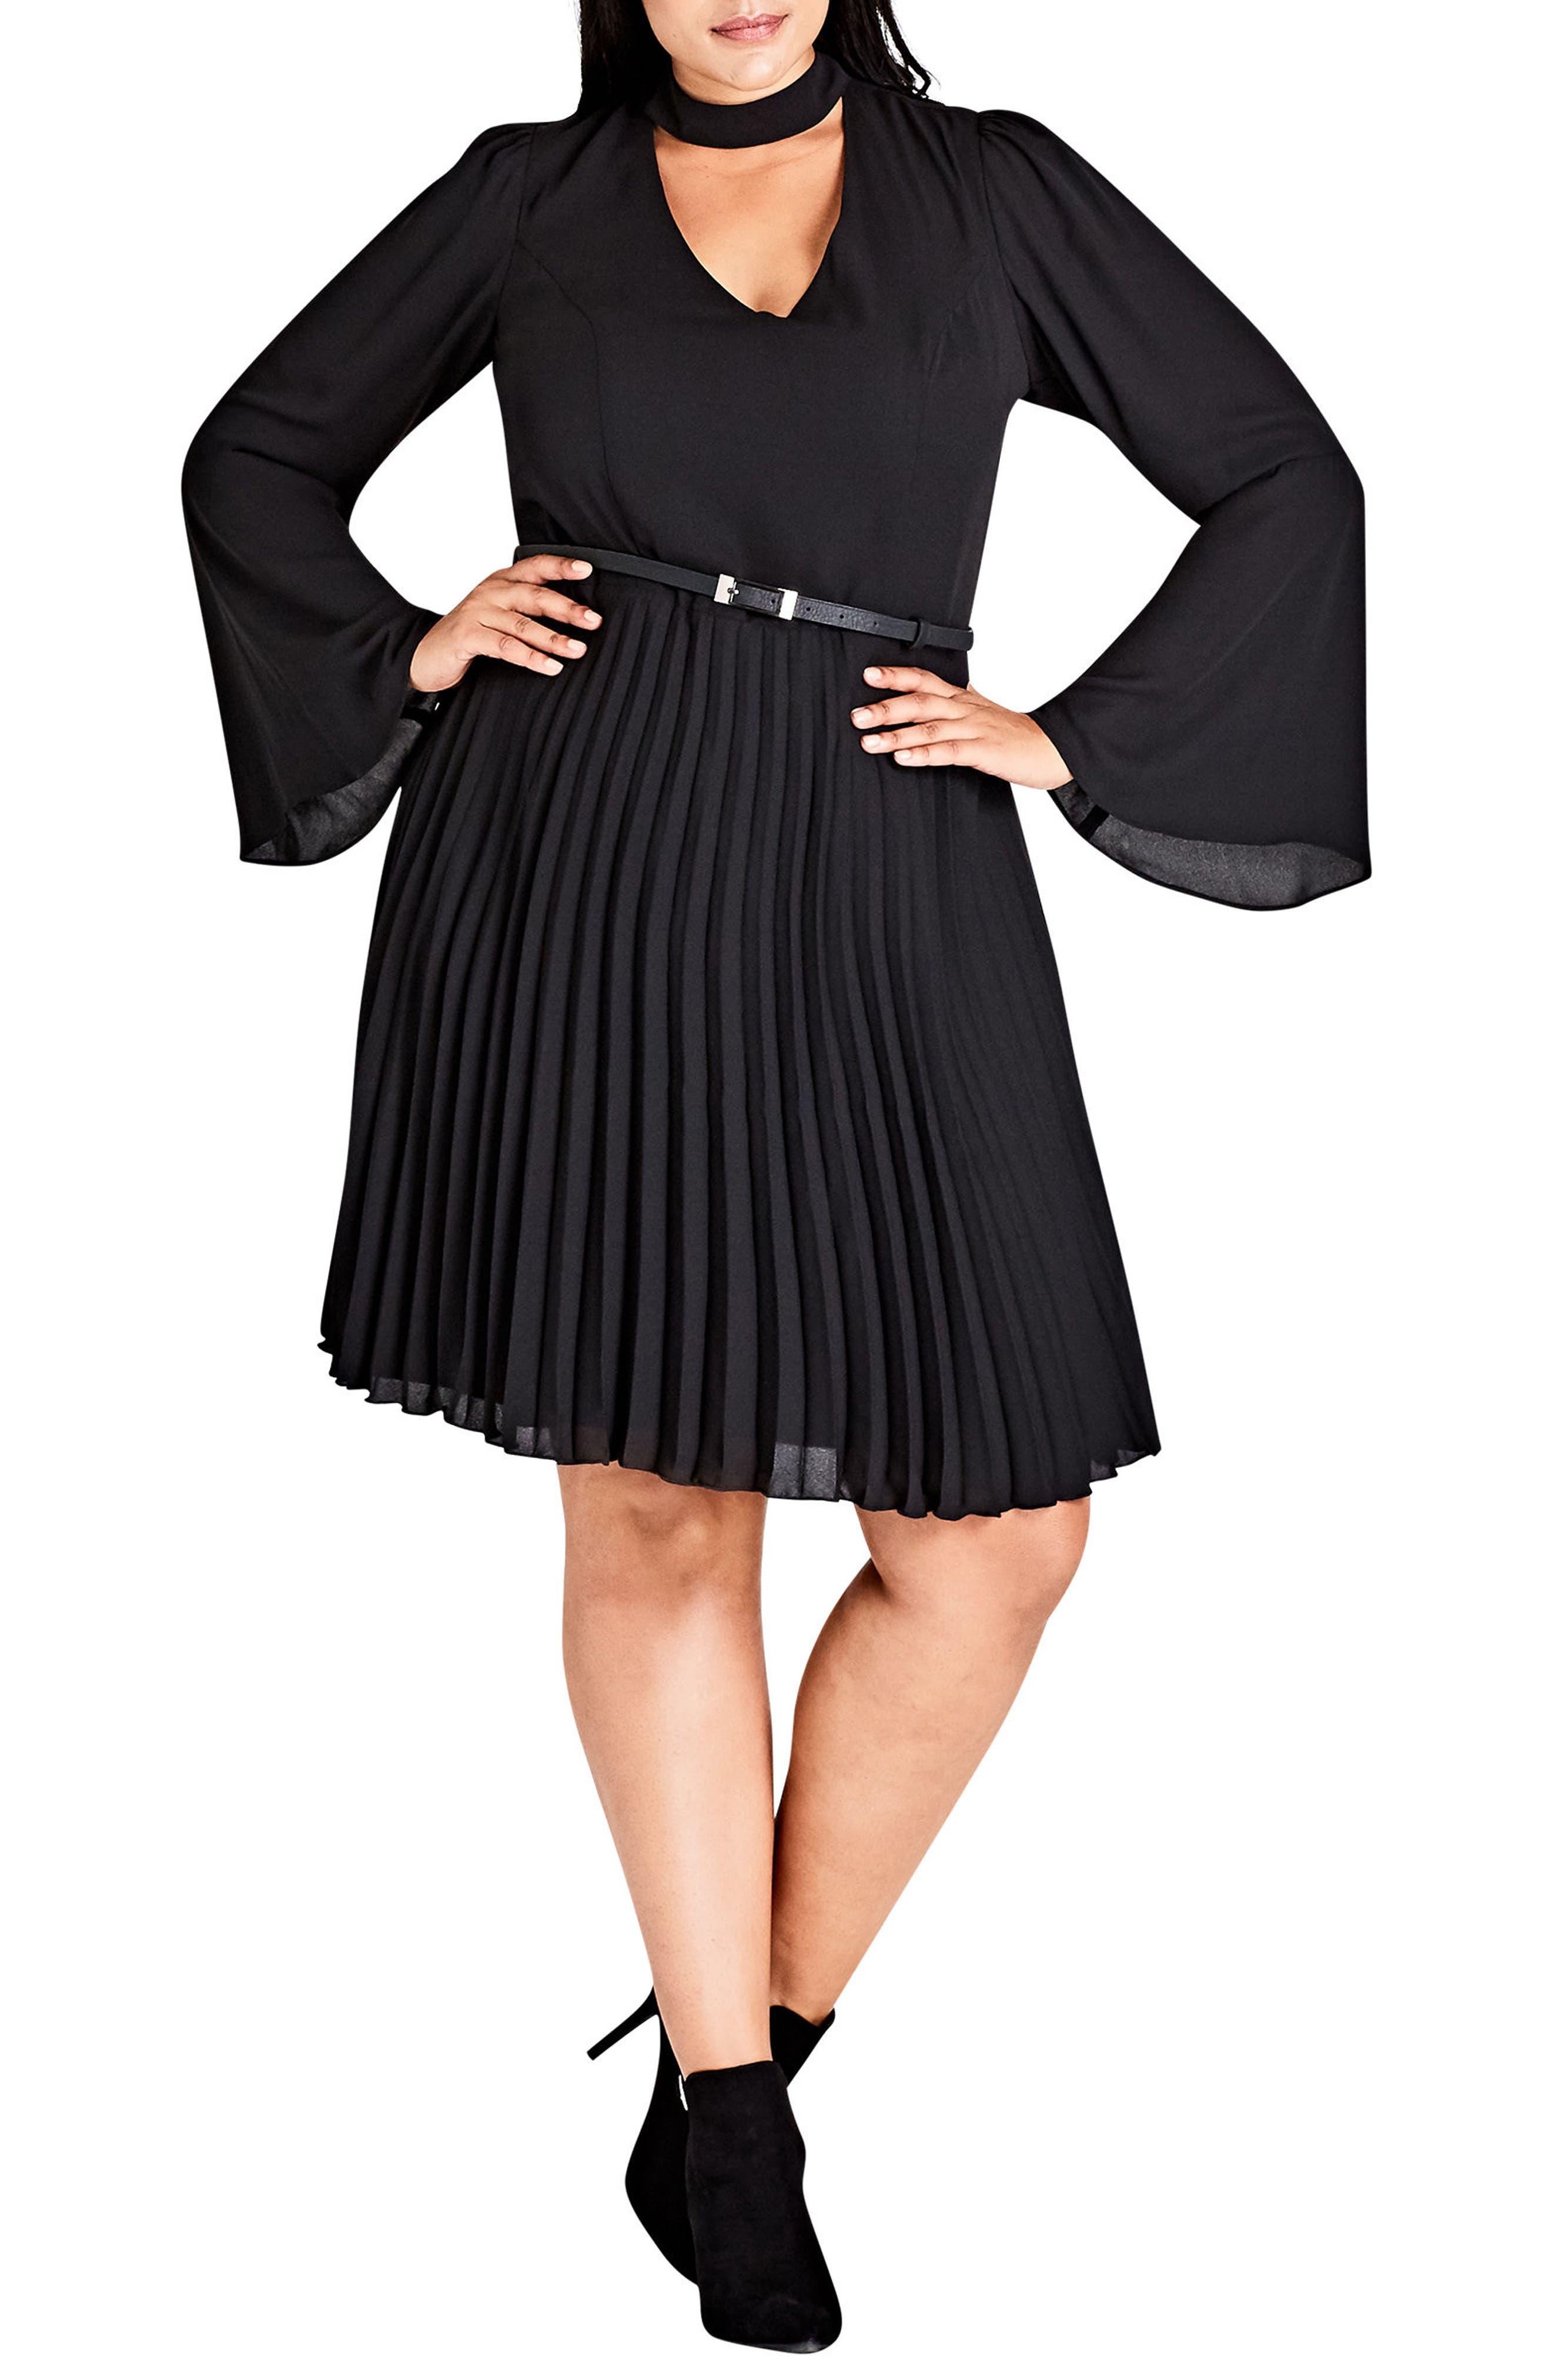 Praise Me Bell Sleeve Choker Neck Dress,                         Main,                         color, Black